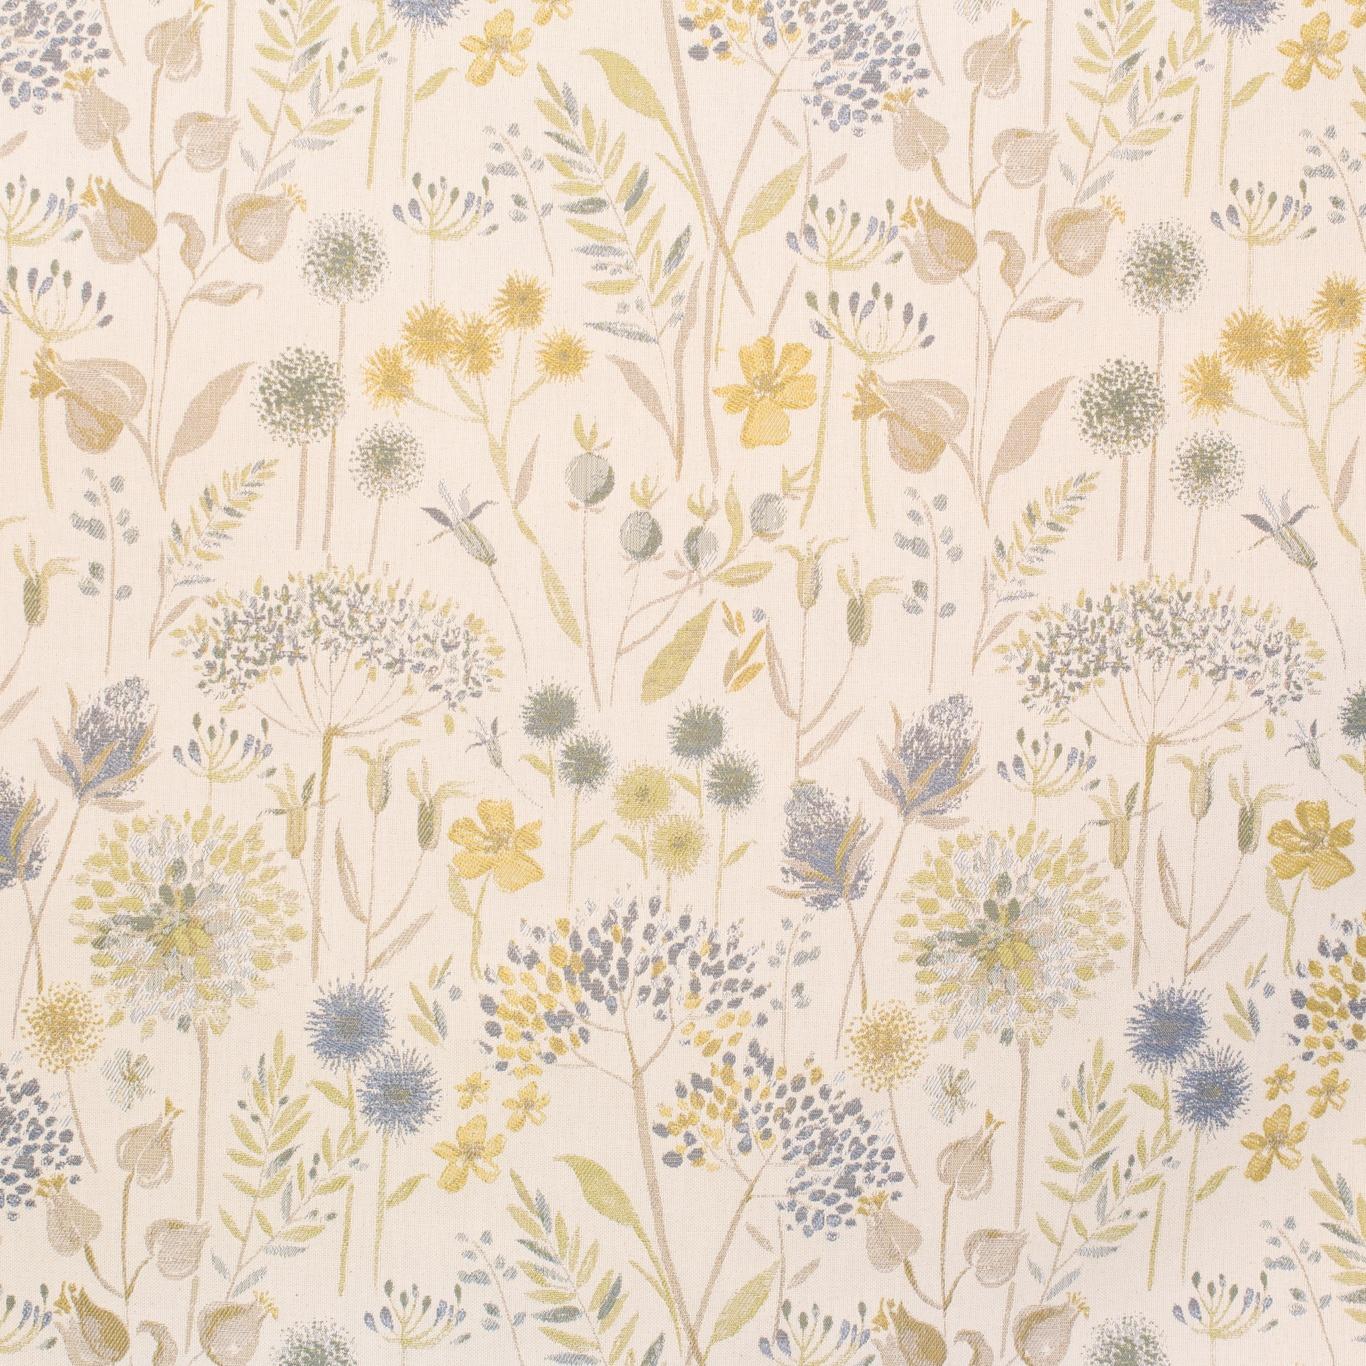 Image of Voyage Flora Cream Duck Egg Curtain Fabric